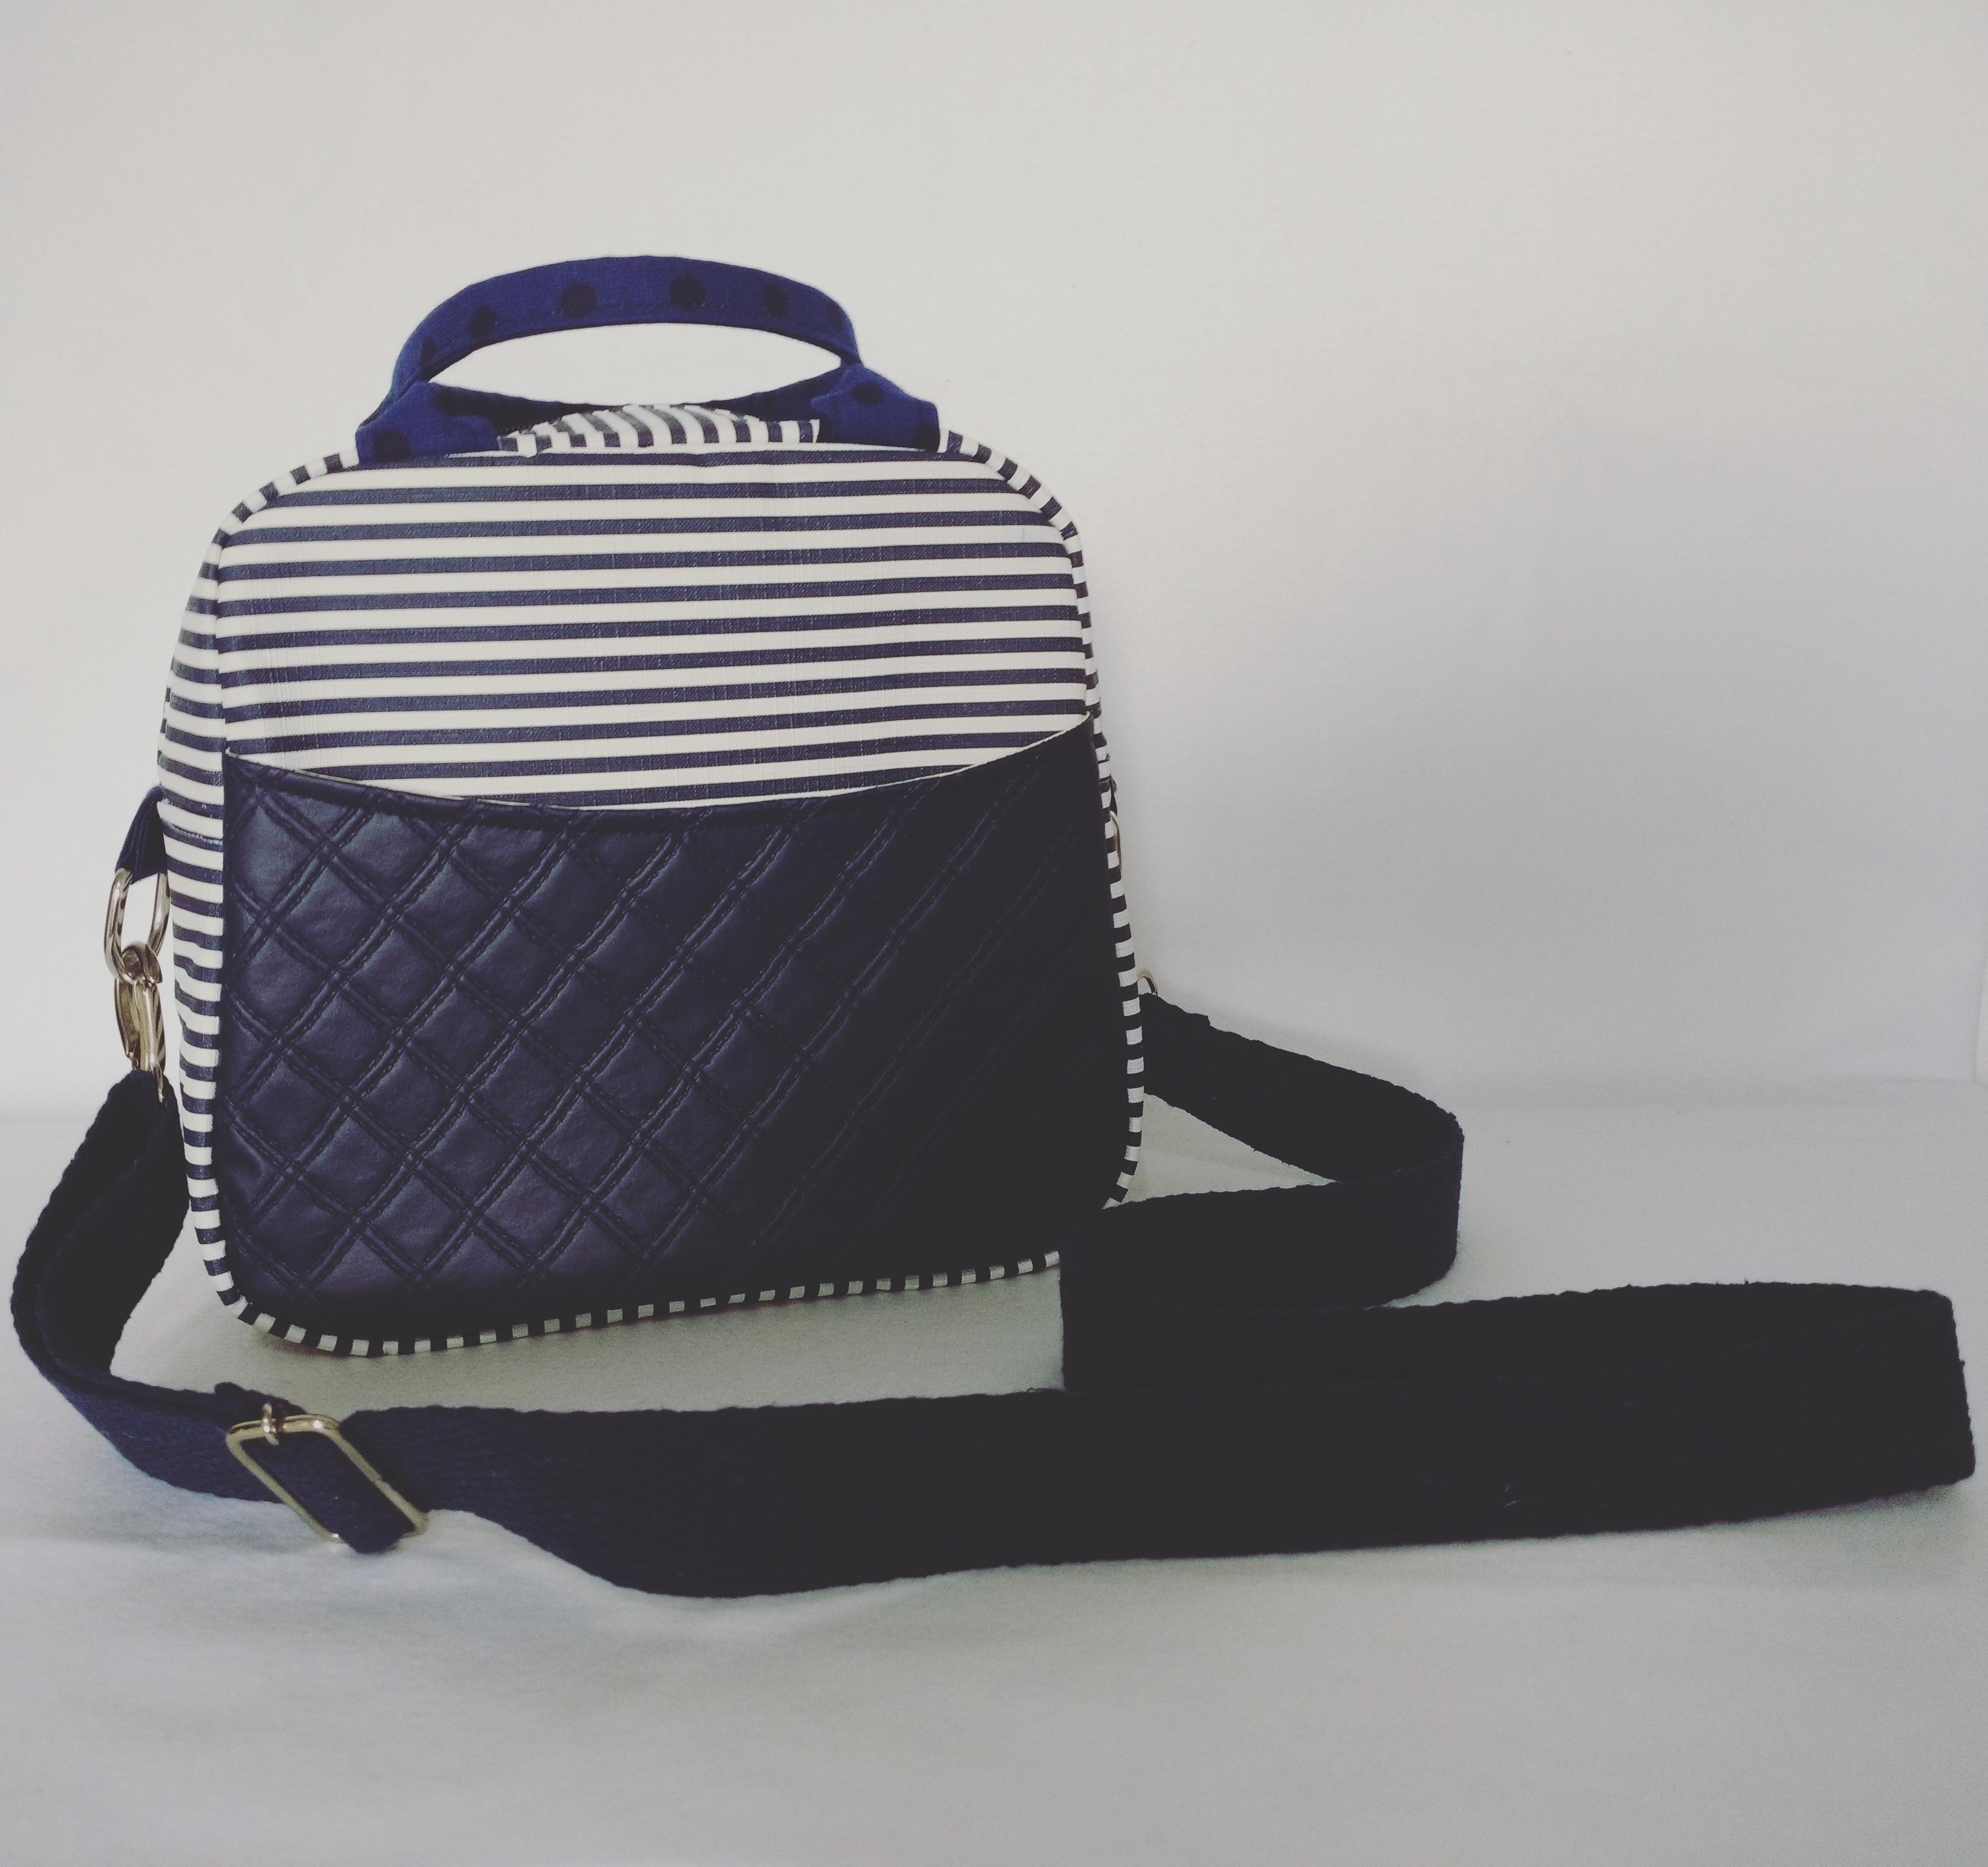 Bolsa Bucket Listrada Azul Marinho  a69d72c38b2